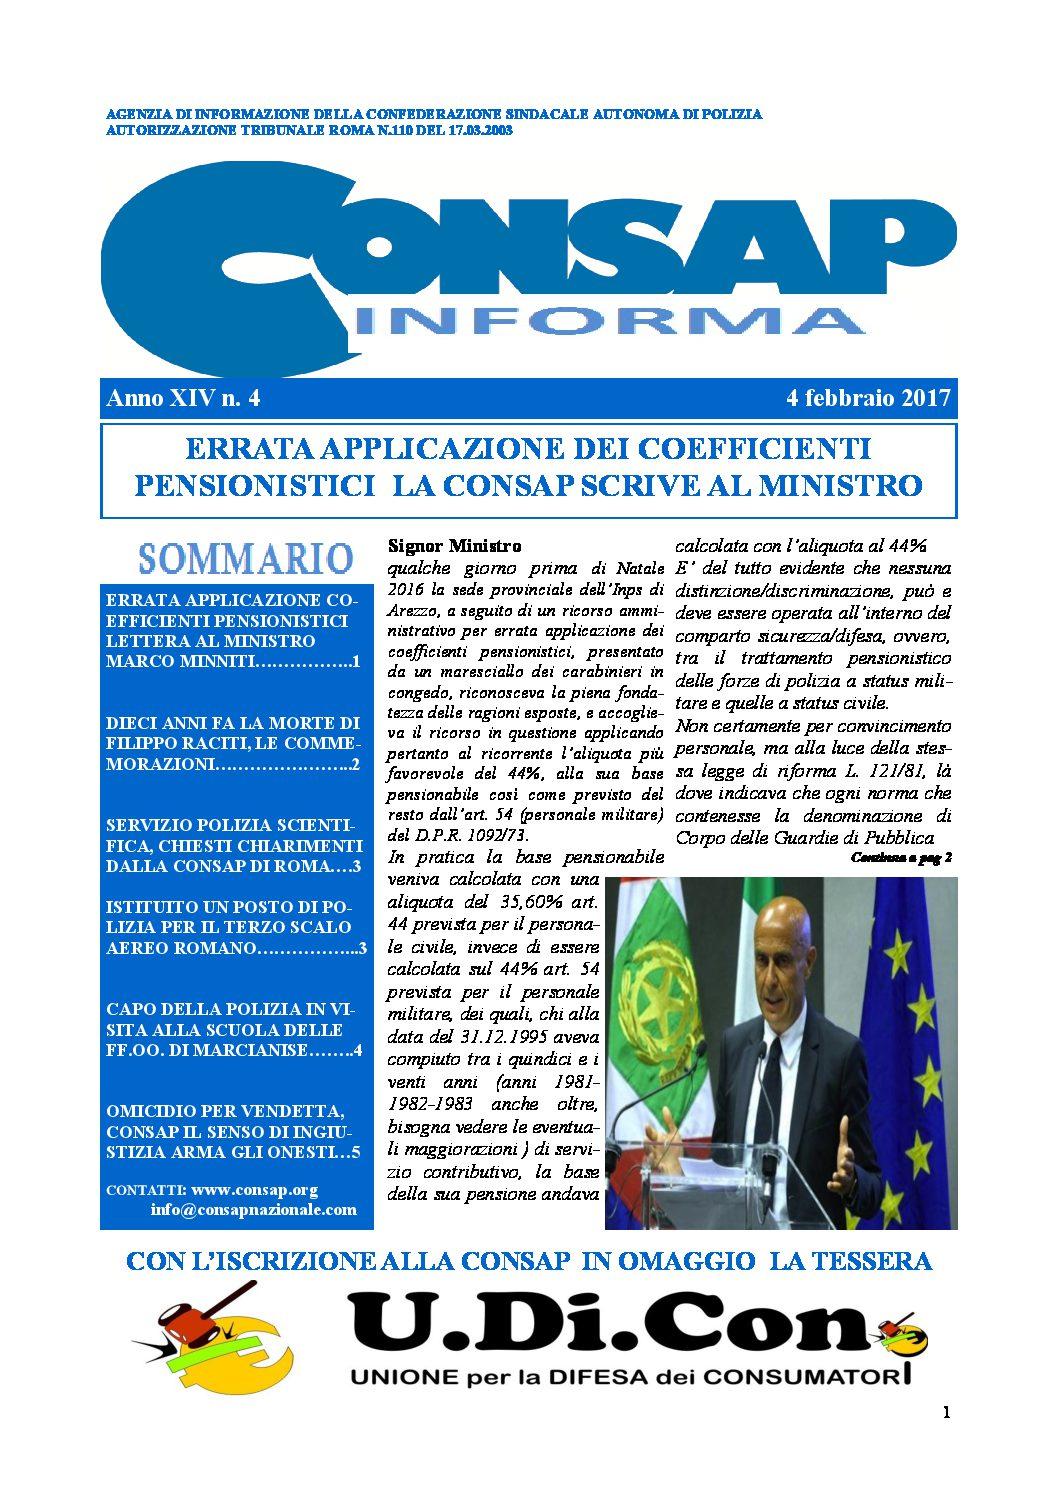 Consap Informa